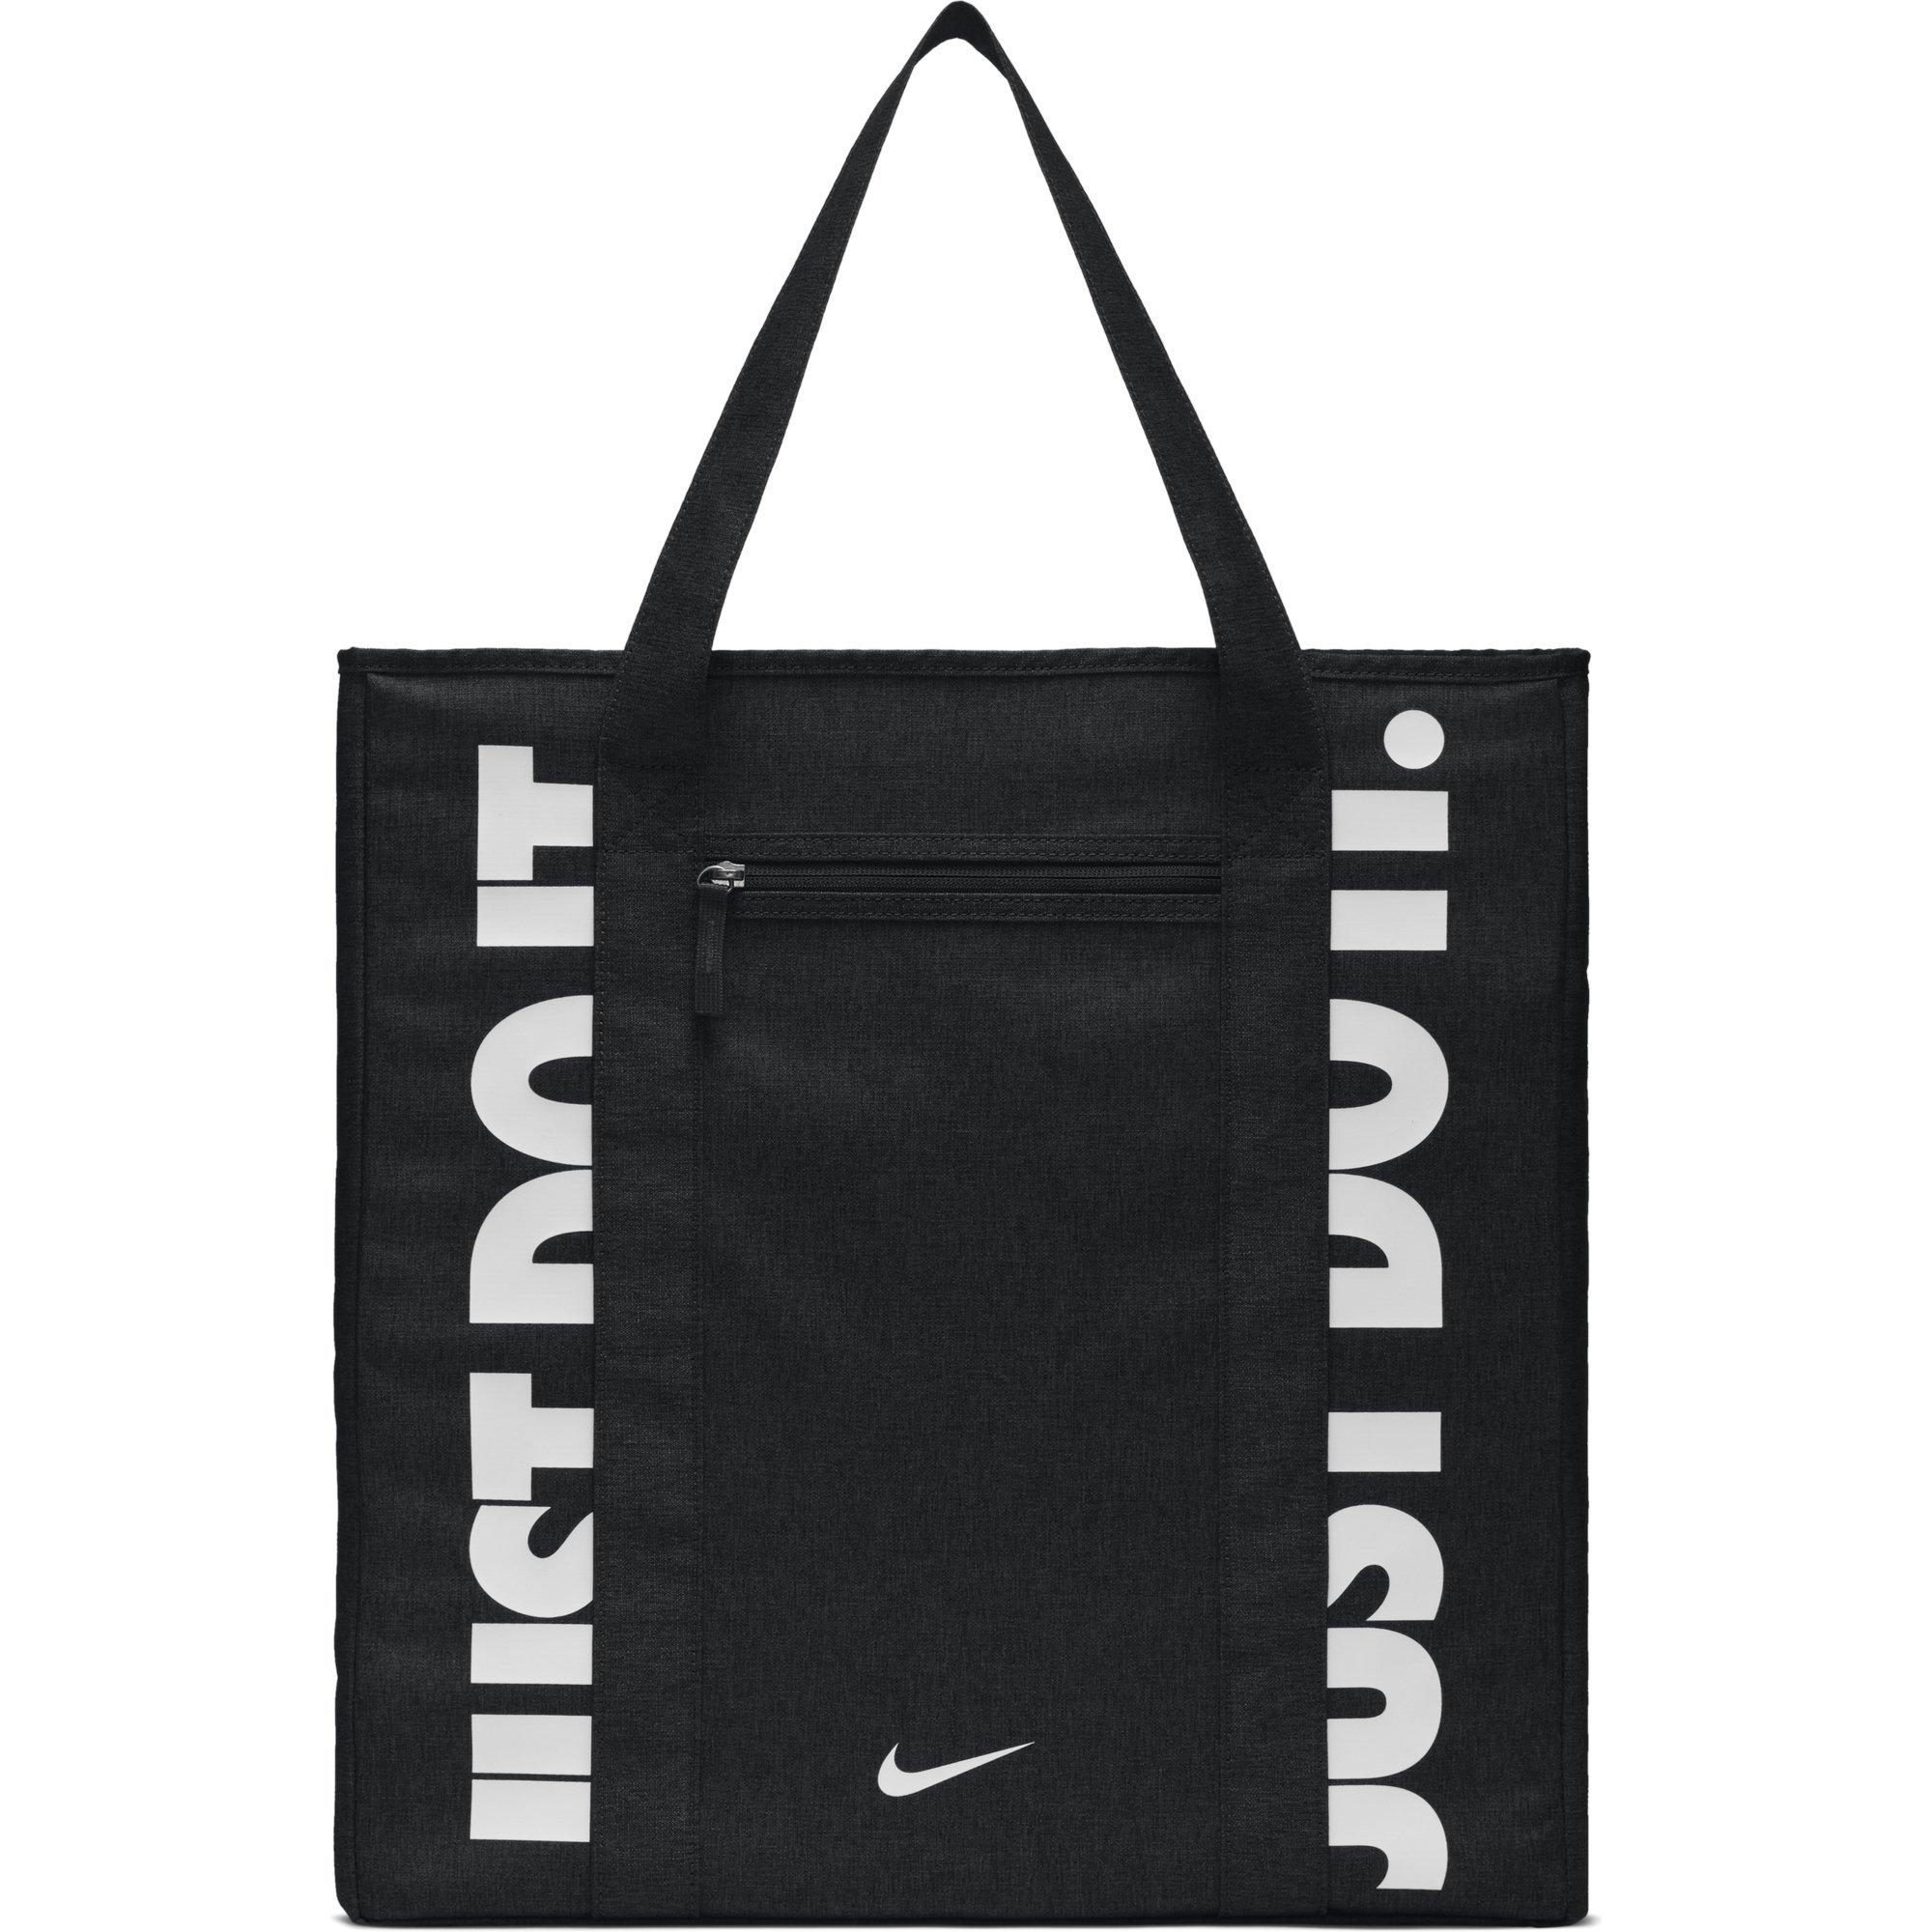 NIKE Gym Women's Training Tote Bag, Black/Black/White, One Size